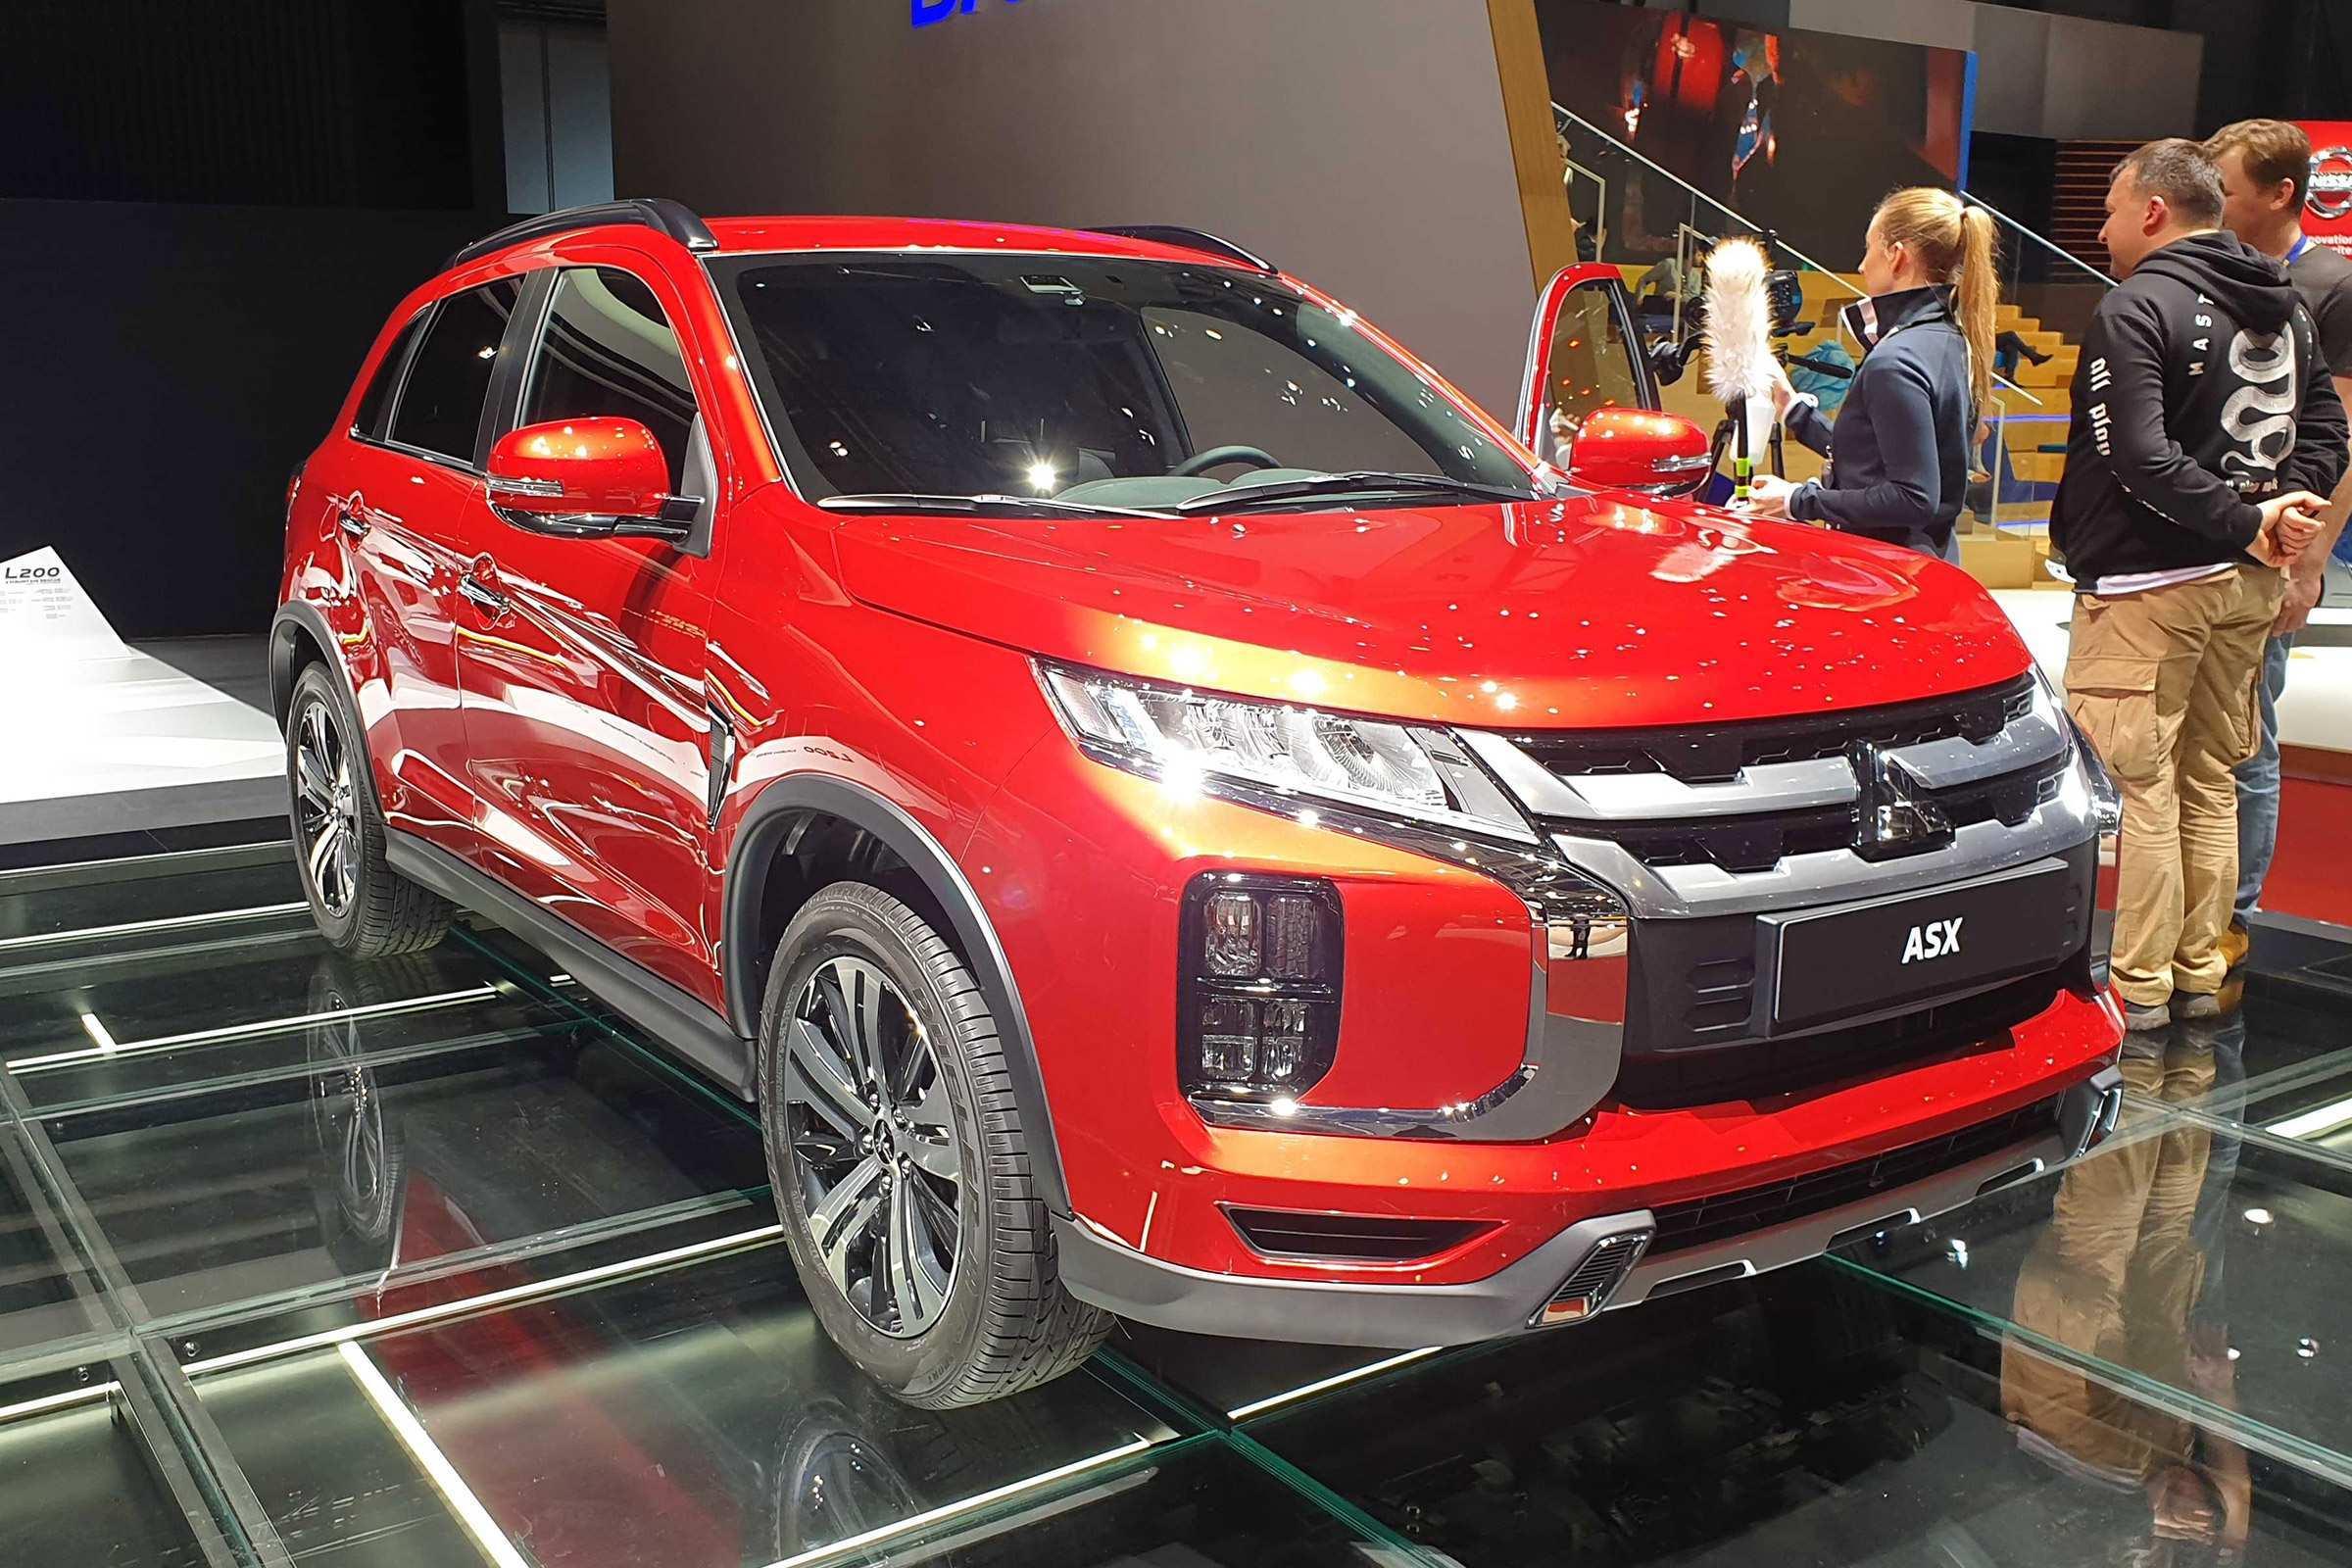 80 Great Mitsubishi Asx 2020 Specs Interior by Mitsubishi Asx 2020 Specs